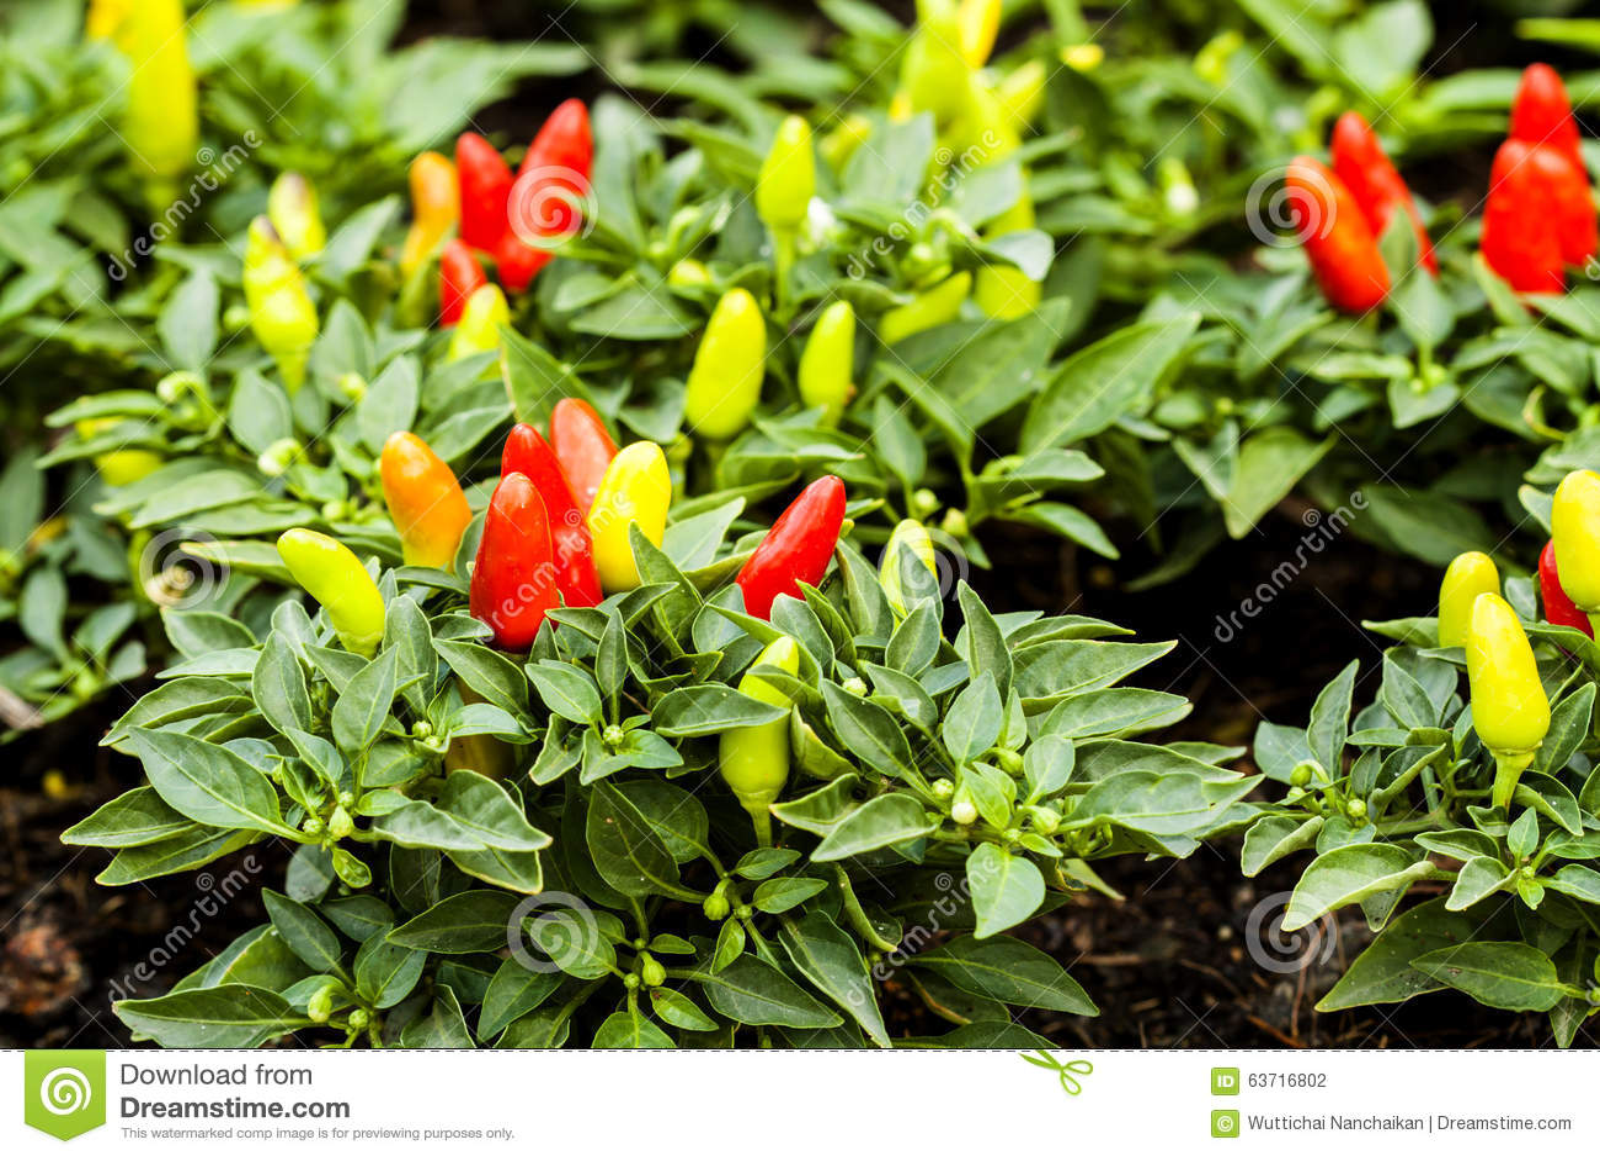 Image gallery piment plantation for Entretien poivron jardin